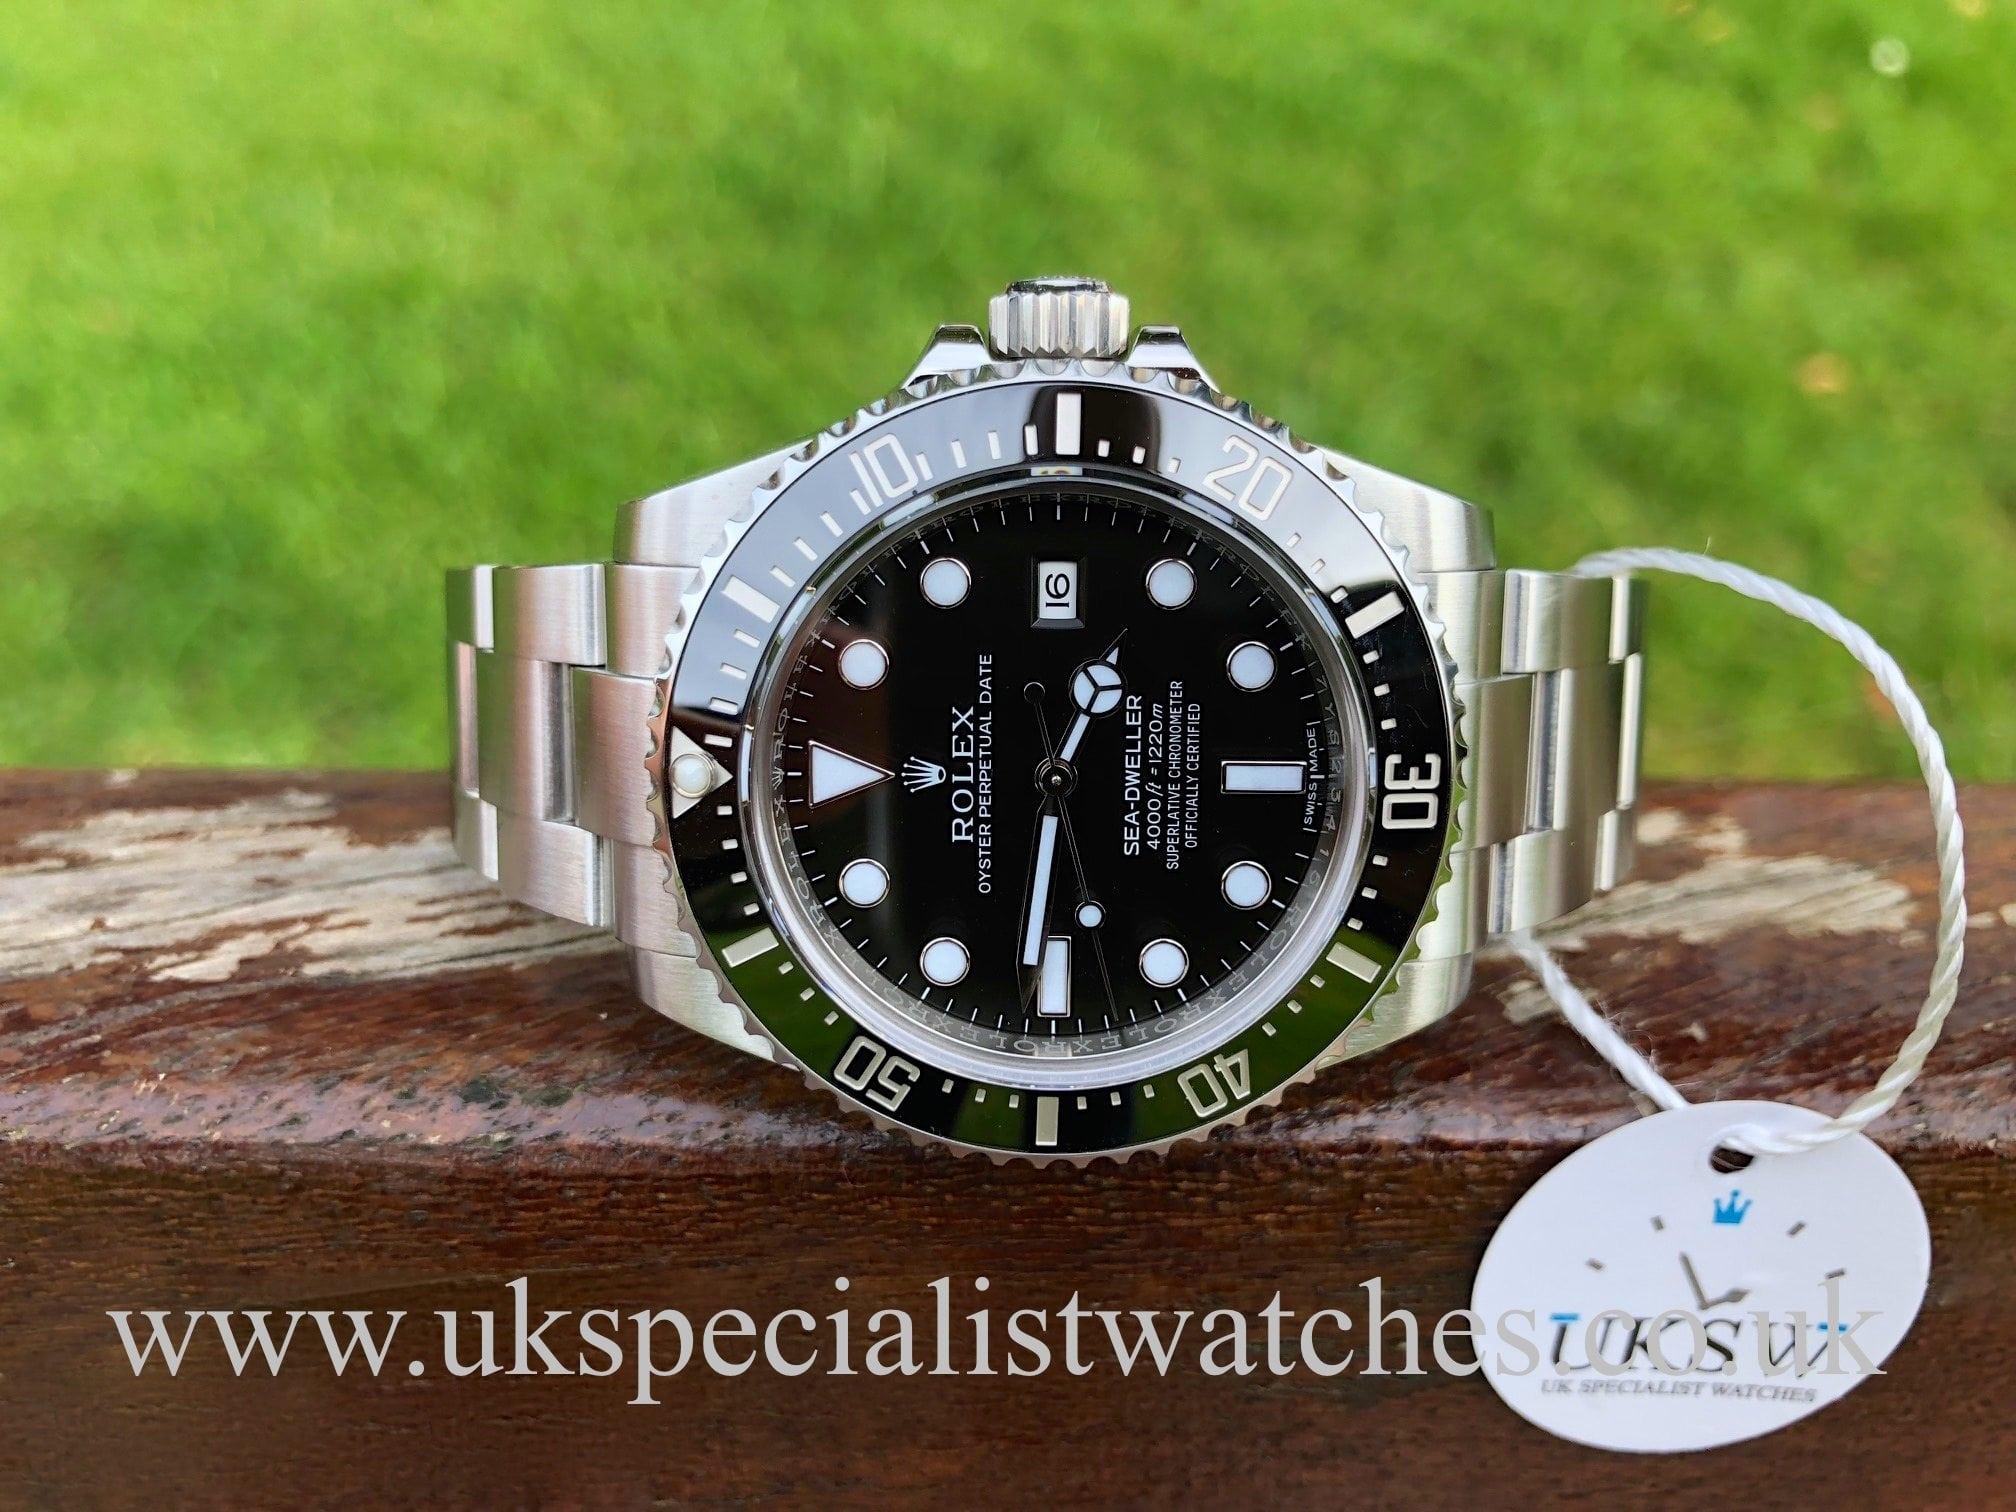 2ddbb167dc9 UK Specialist Watches have a Rolex Sea-Dweller 4000 Ceramic Bezel - 116600  - Full